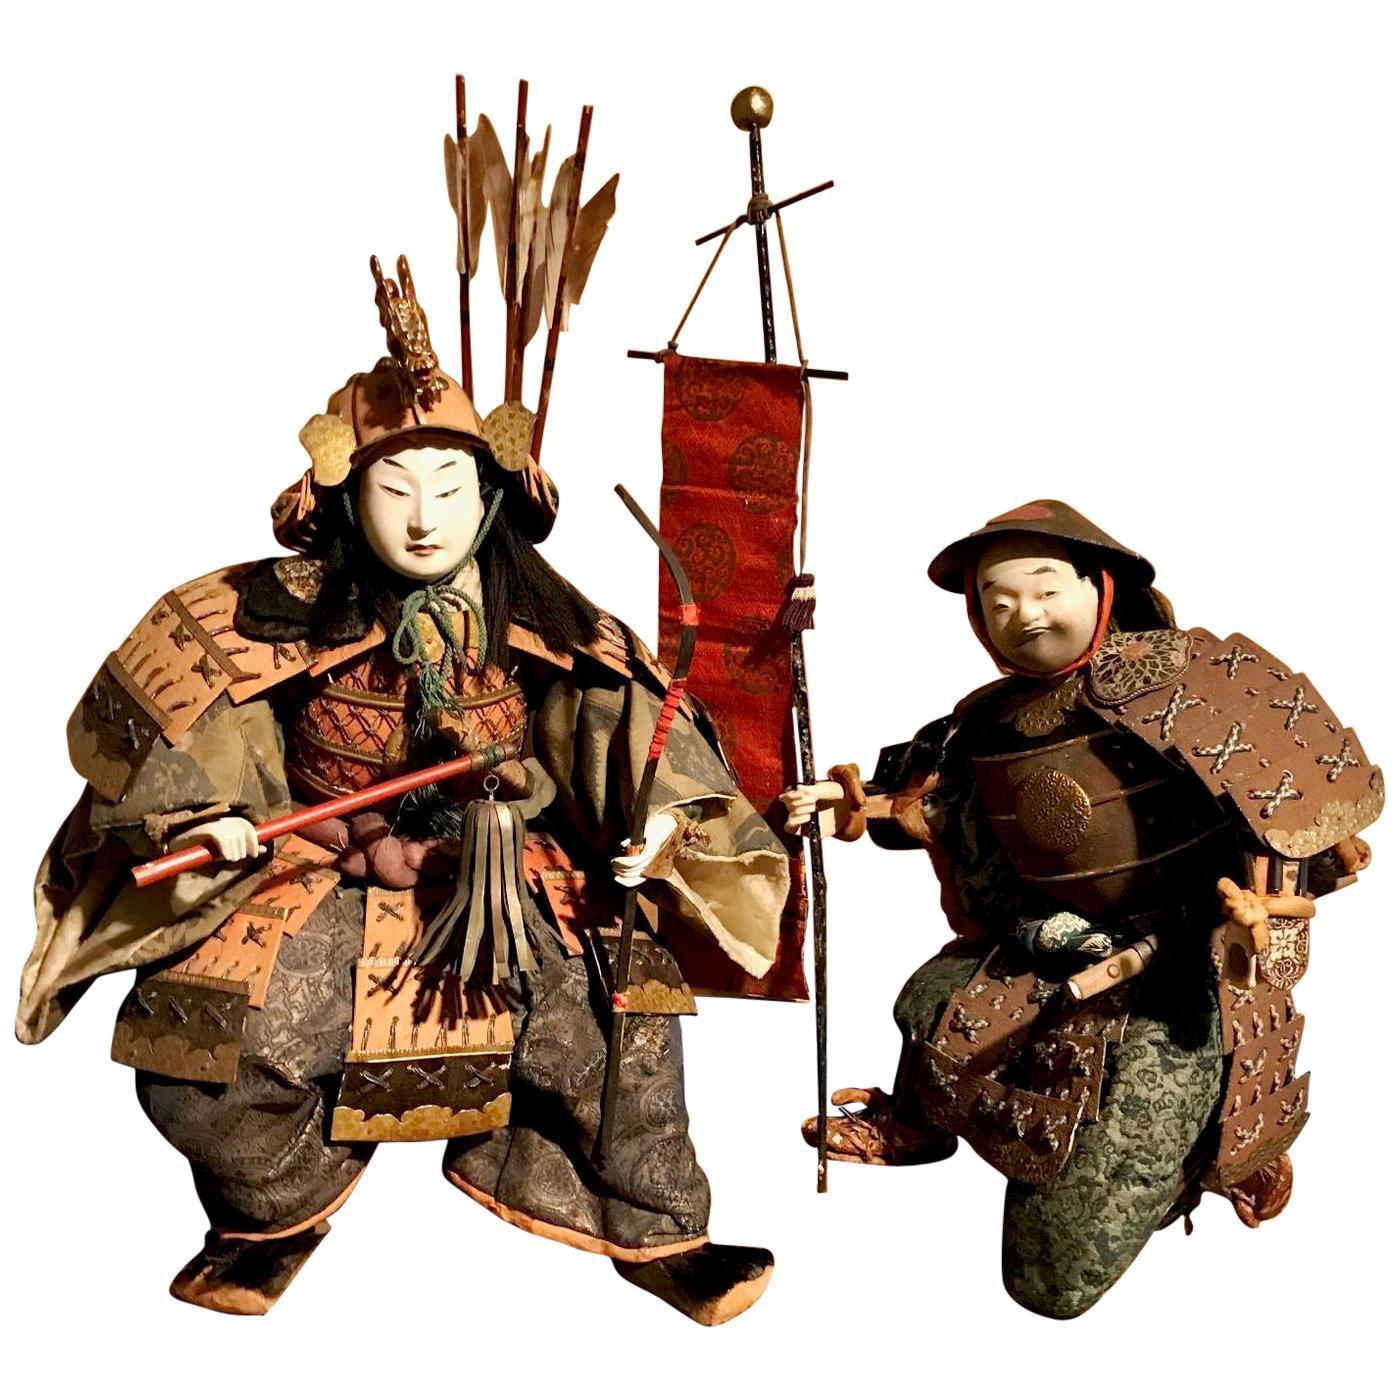 Japanese Edo Period Musha Ningyo Doll of Samurai and Attendant